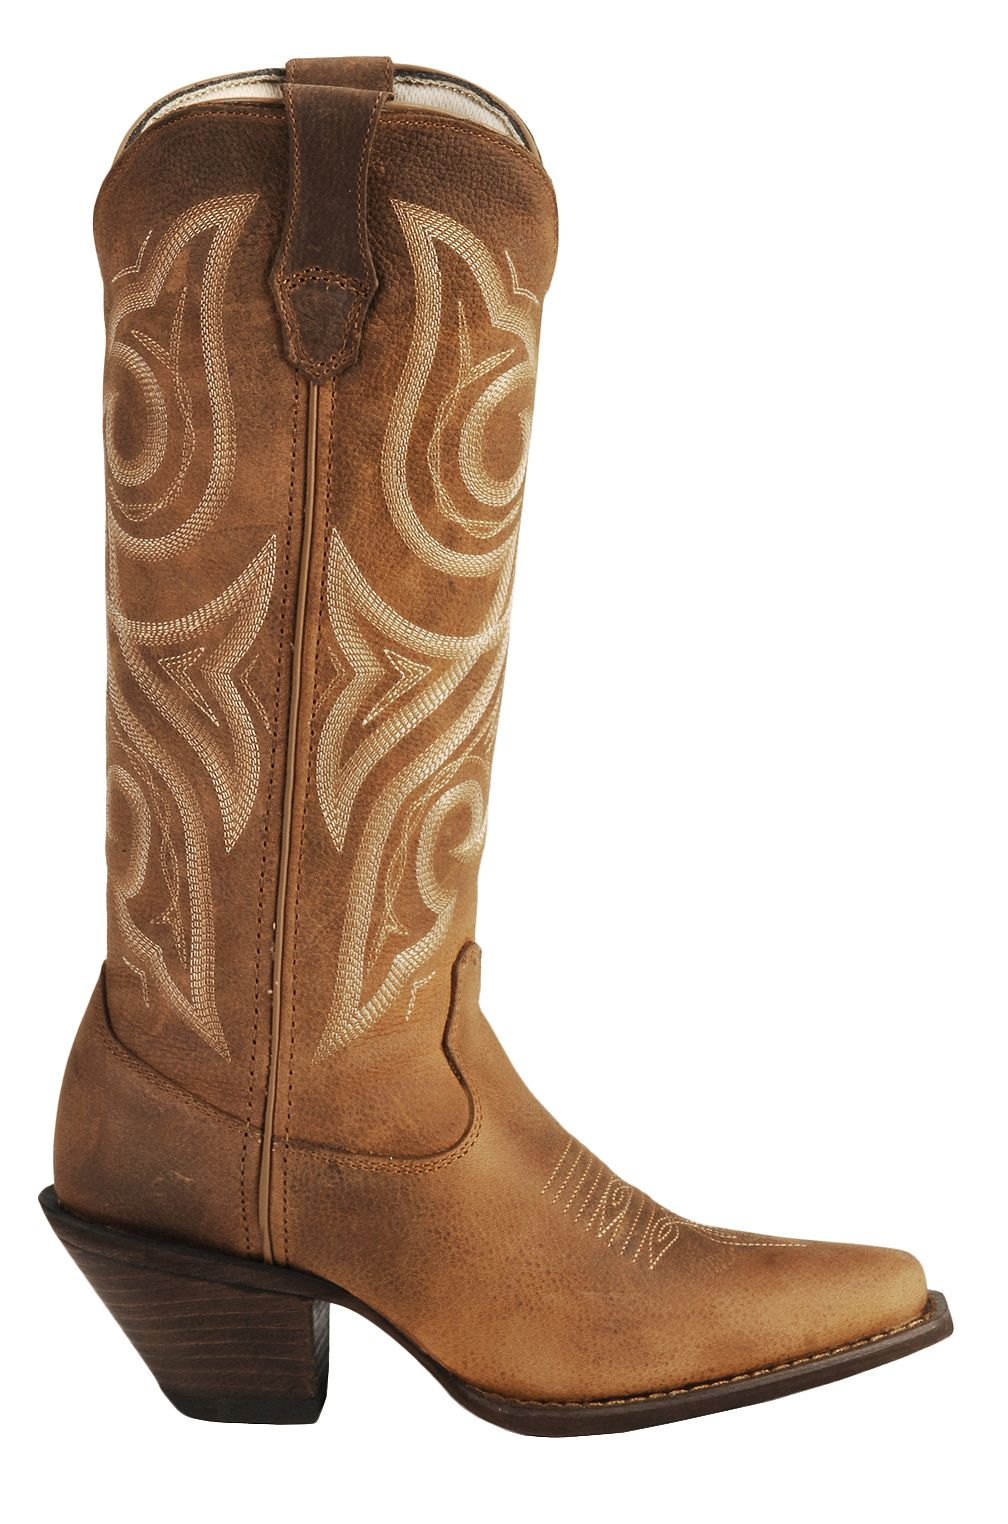 Durango Crush Jealousy Women's ... Cowboy Boots gk7X4Hqc3V